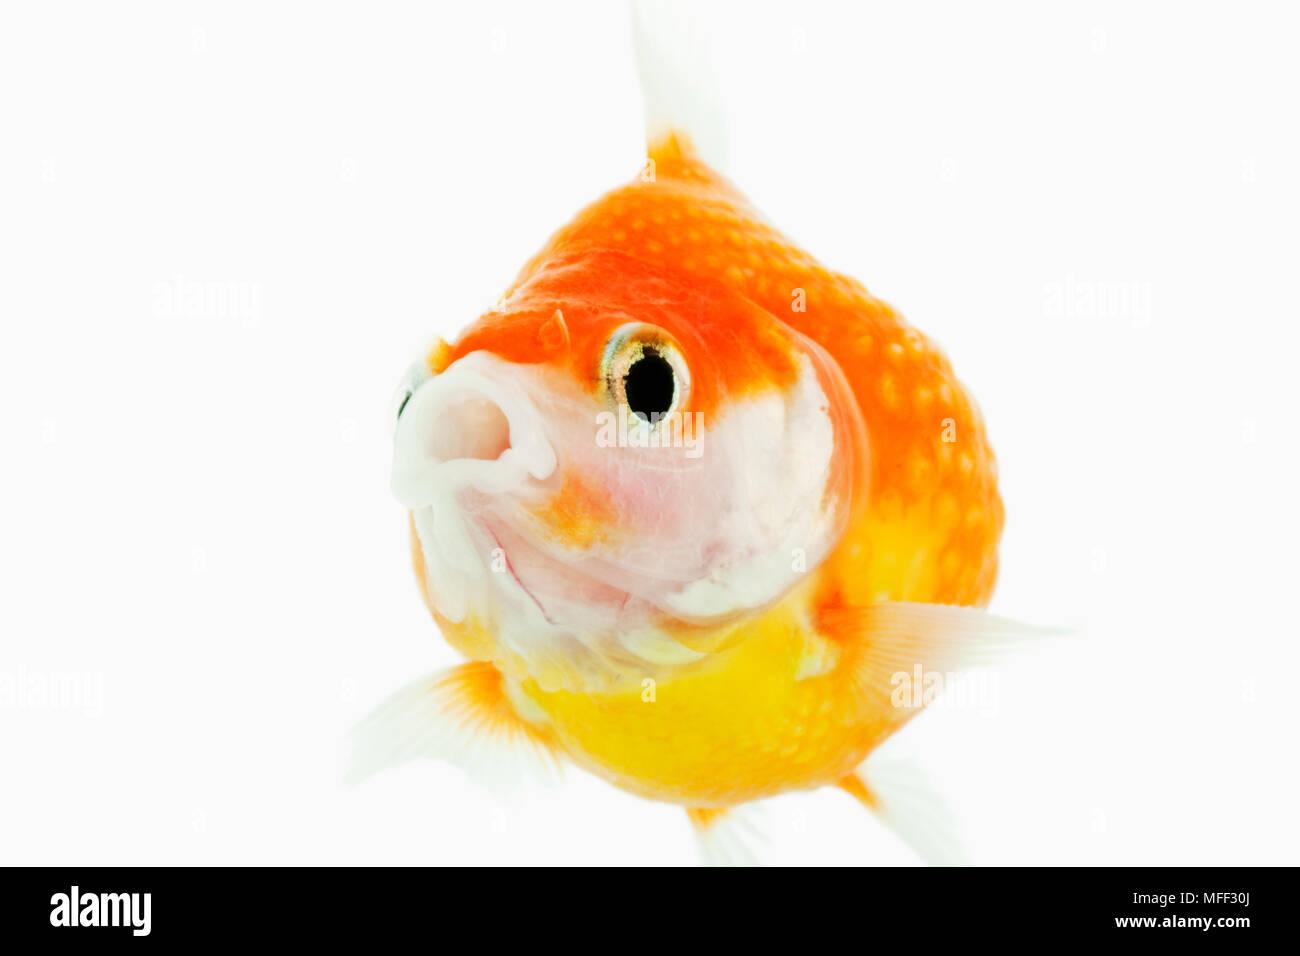 Pearlscale goldfish (Carassius auratus). Fresh water fish. Variety of fancy goldfish. Close-up of face. Studio shot against white background.Asian ori Stock Photo